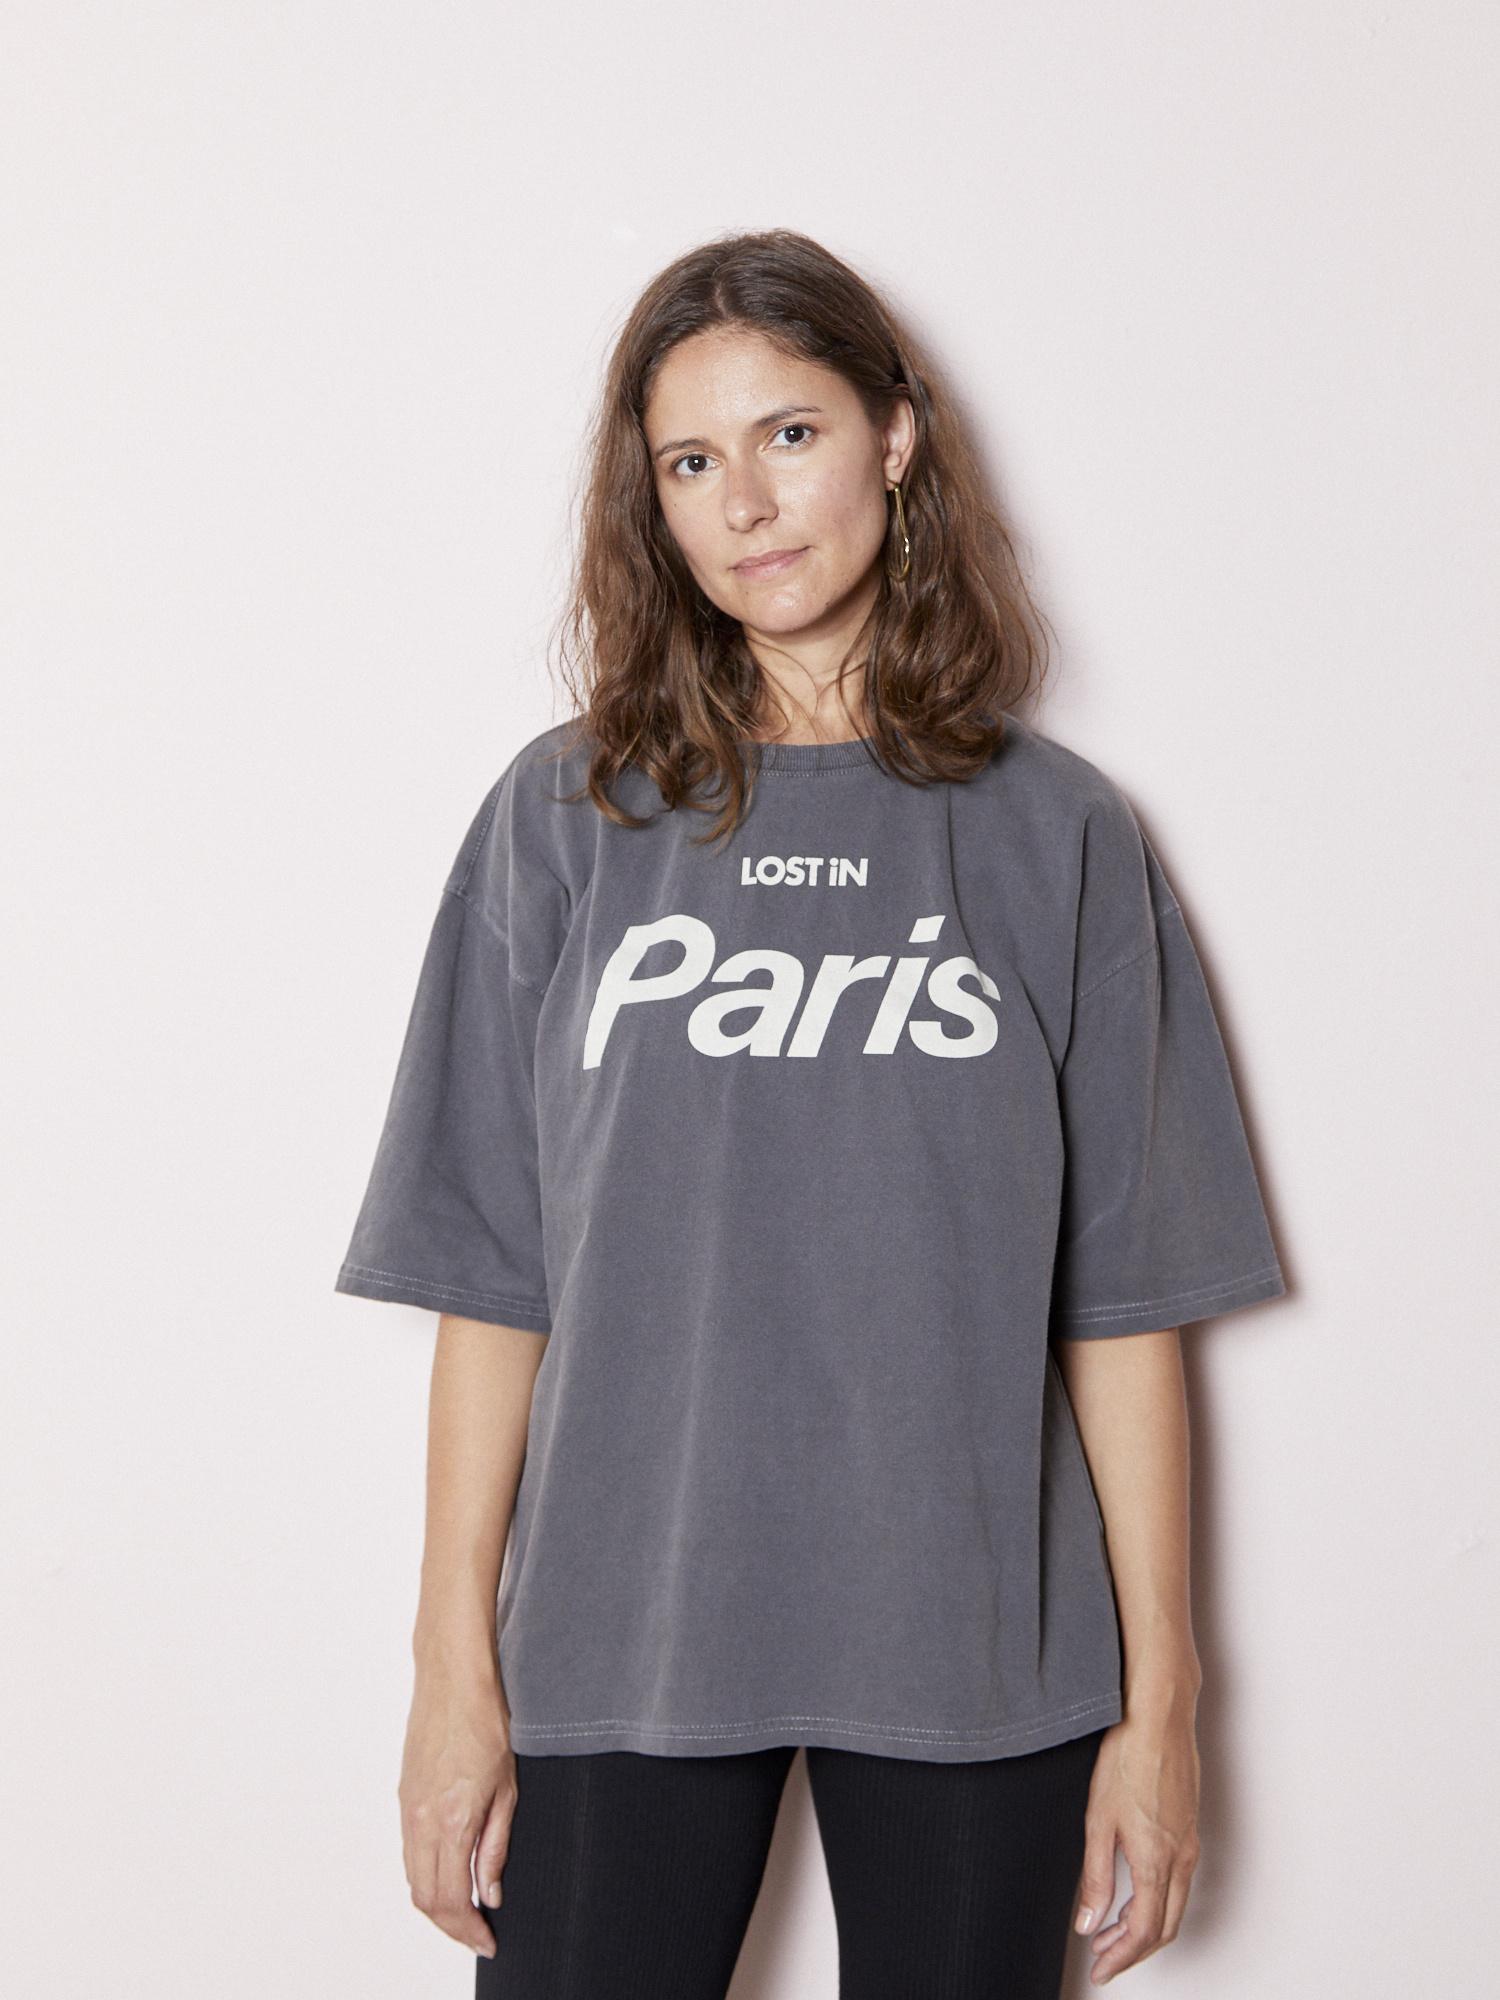 Love Yourself ( Tarrot) Paris Slogan T-Shirt